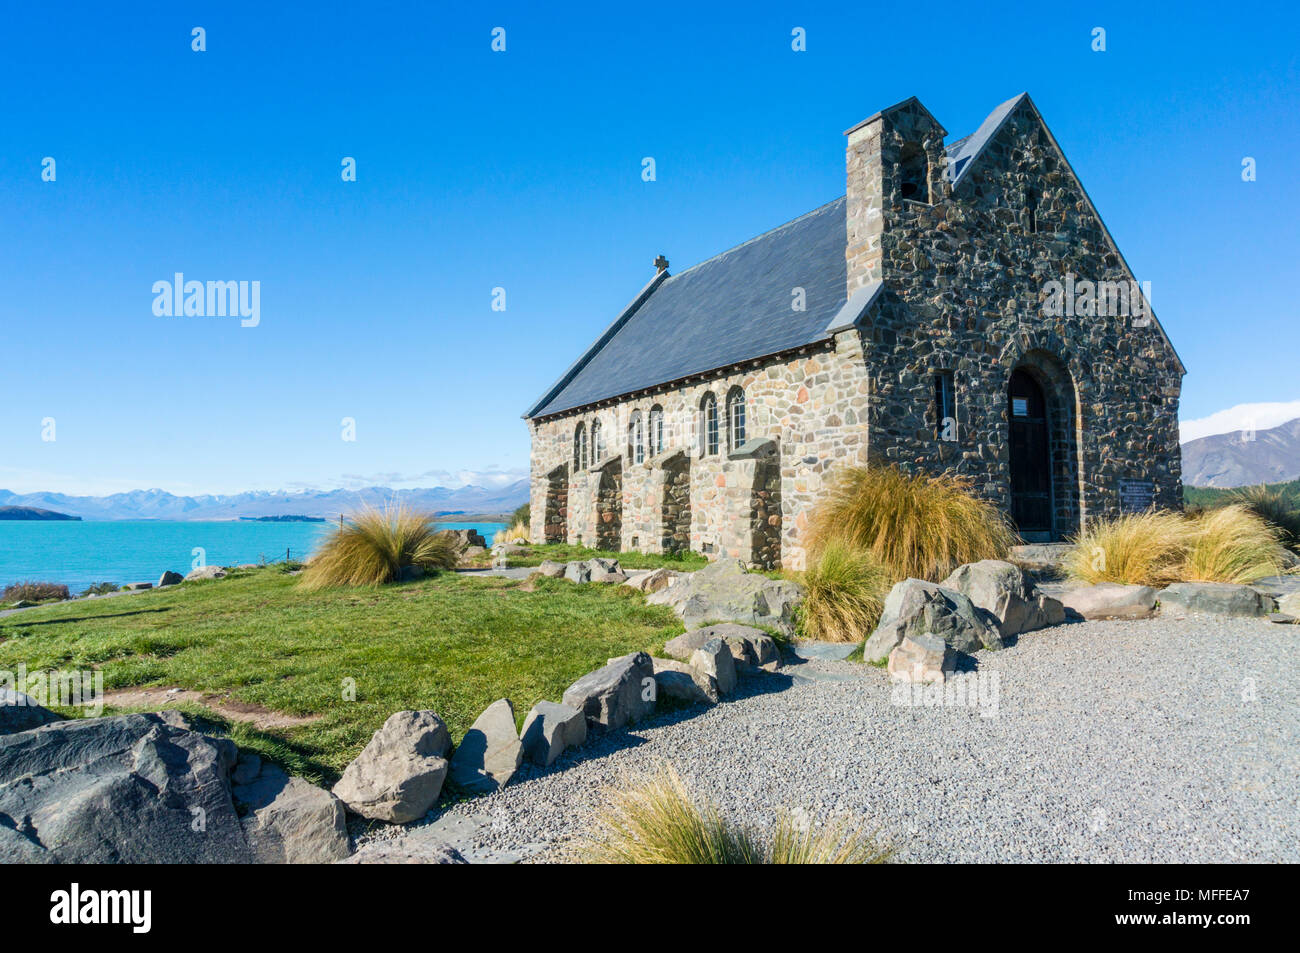 church of the good shepherd  lake tekapo new zealand mackenzie district south island nz TEKAPO lake tekapo new zealand south island new zealand - Stock Image